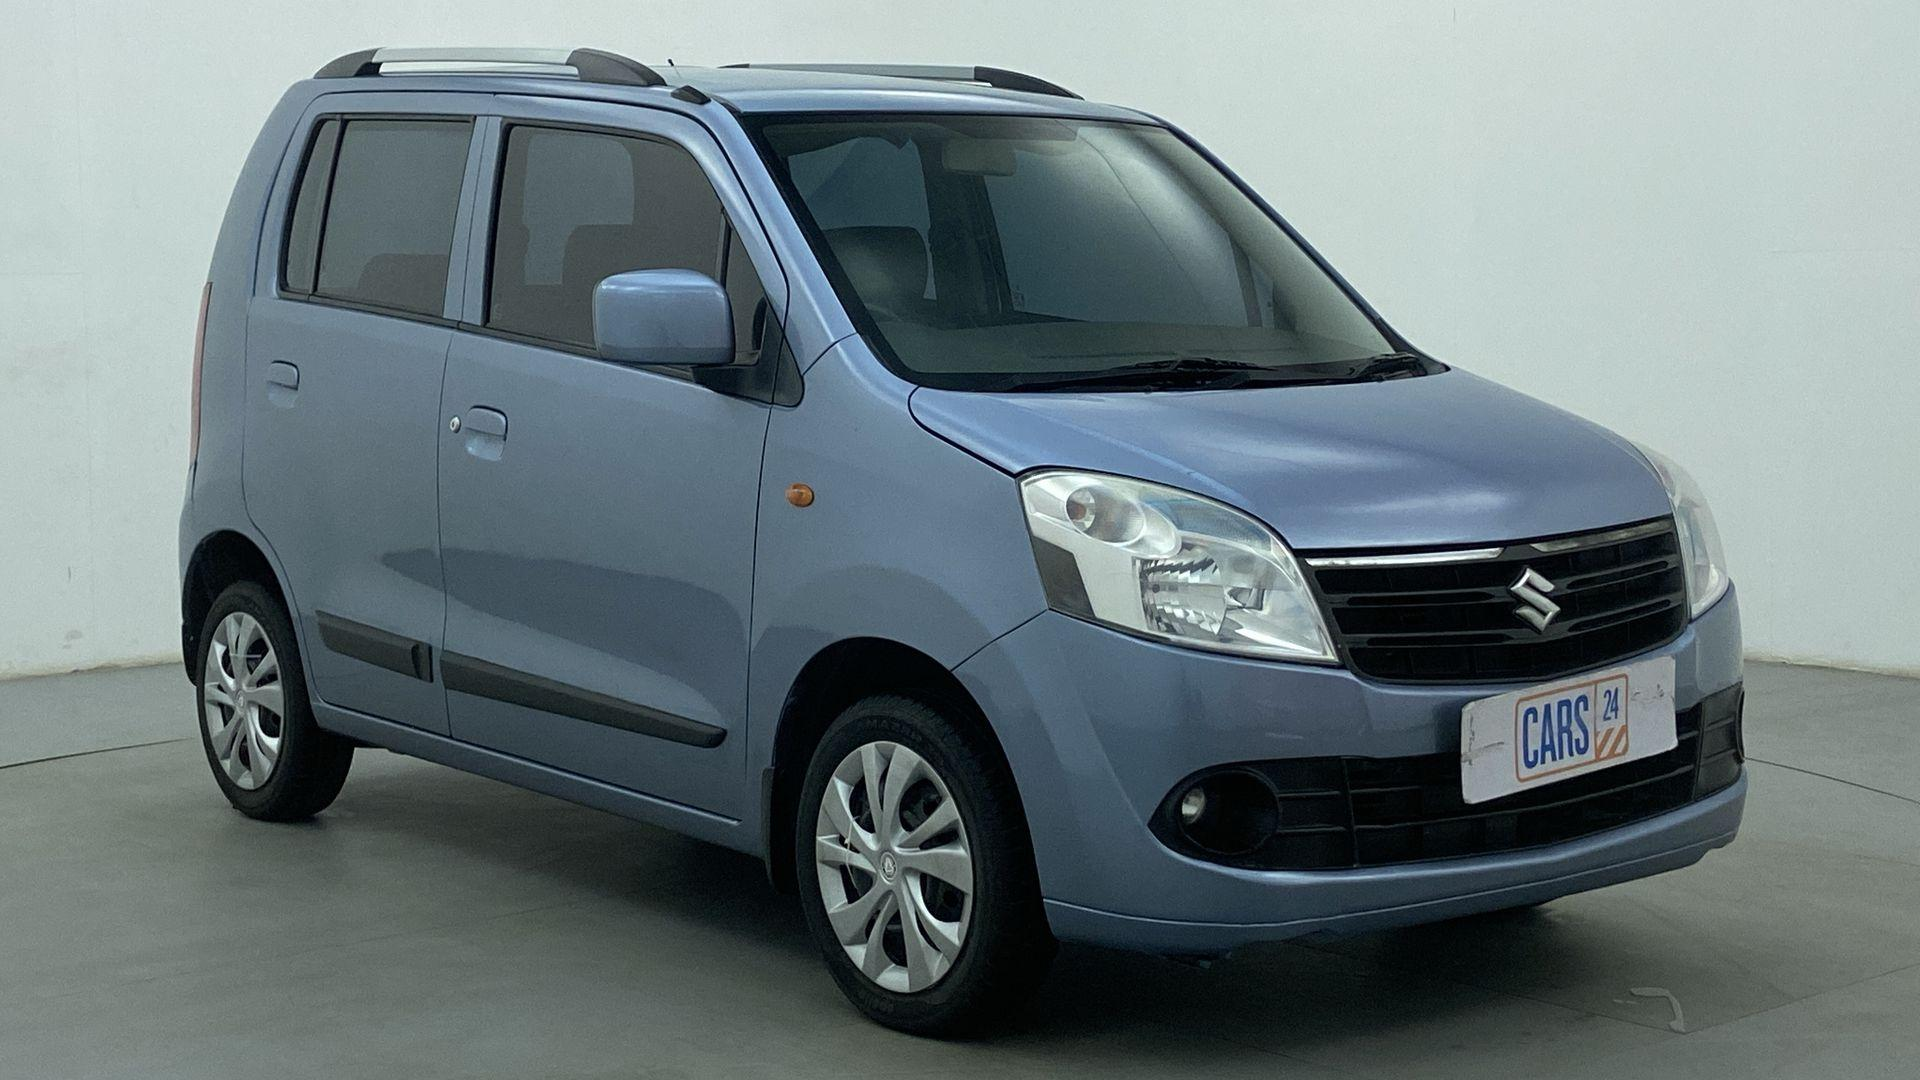 2011 Maruti Wagon R 1.0 VXI